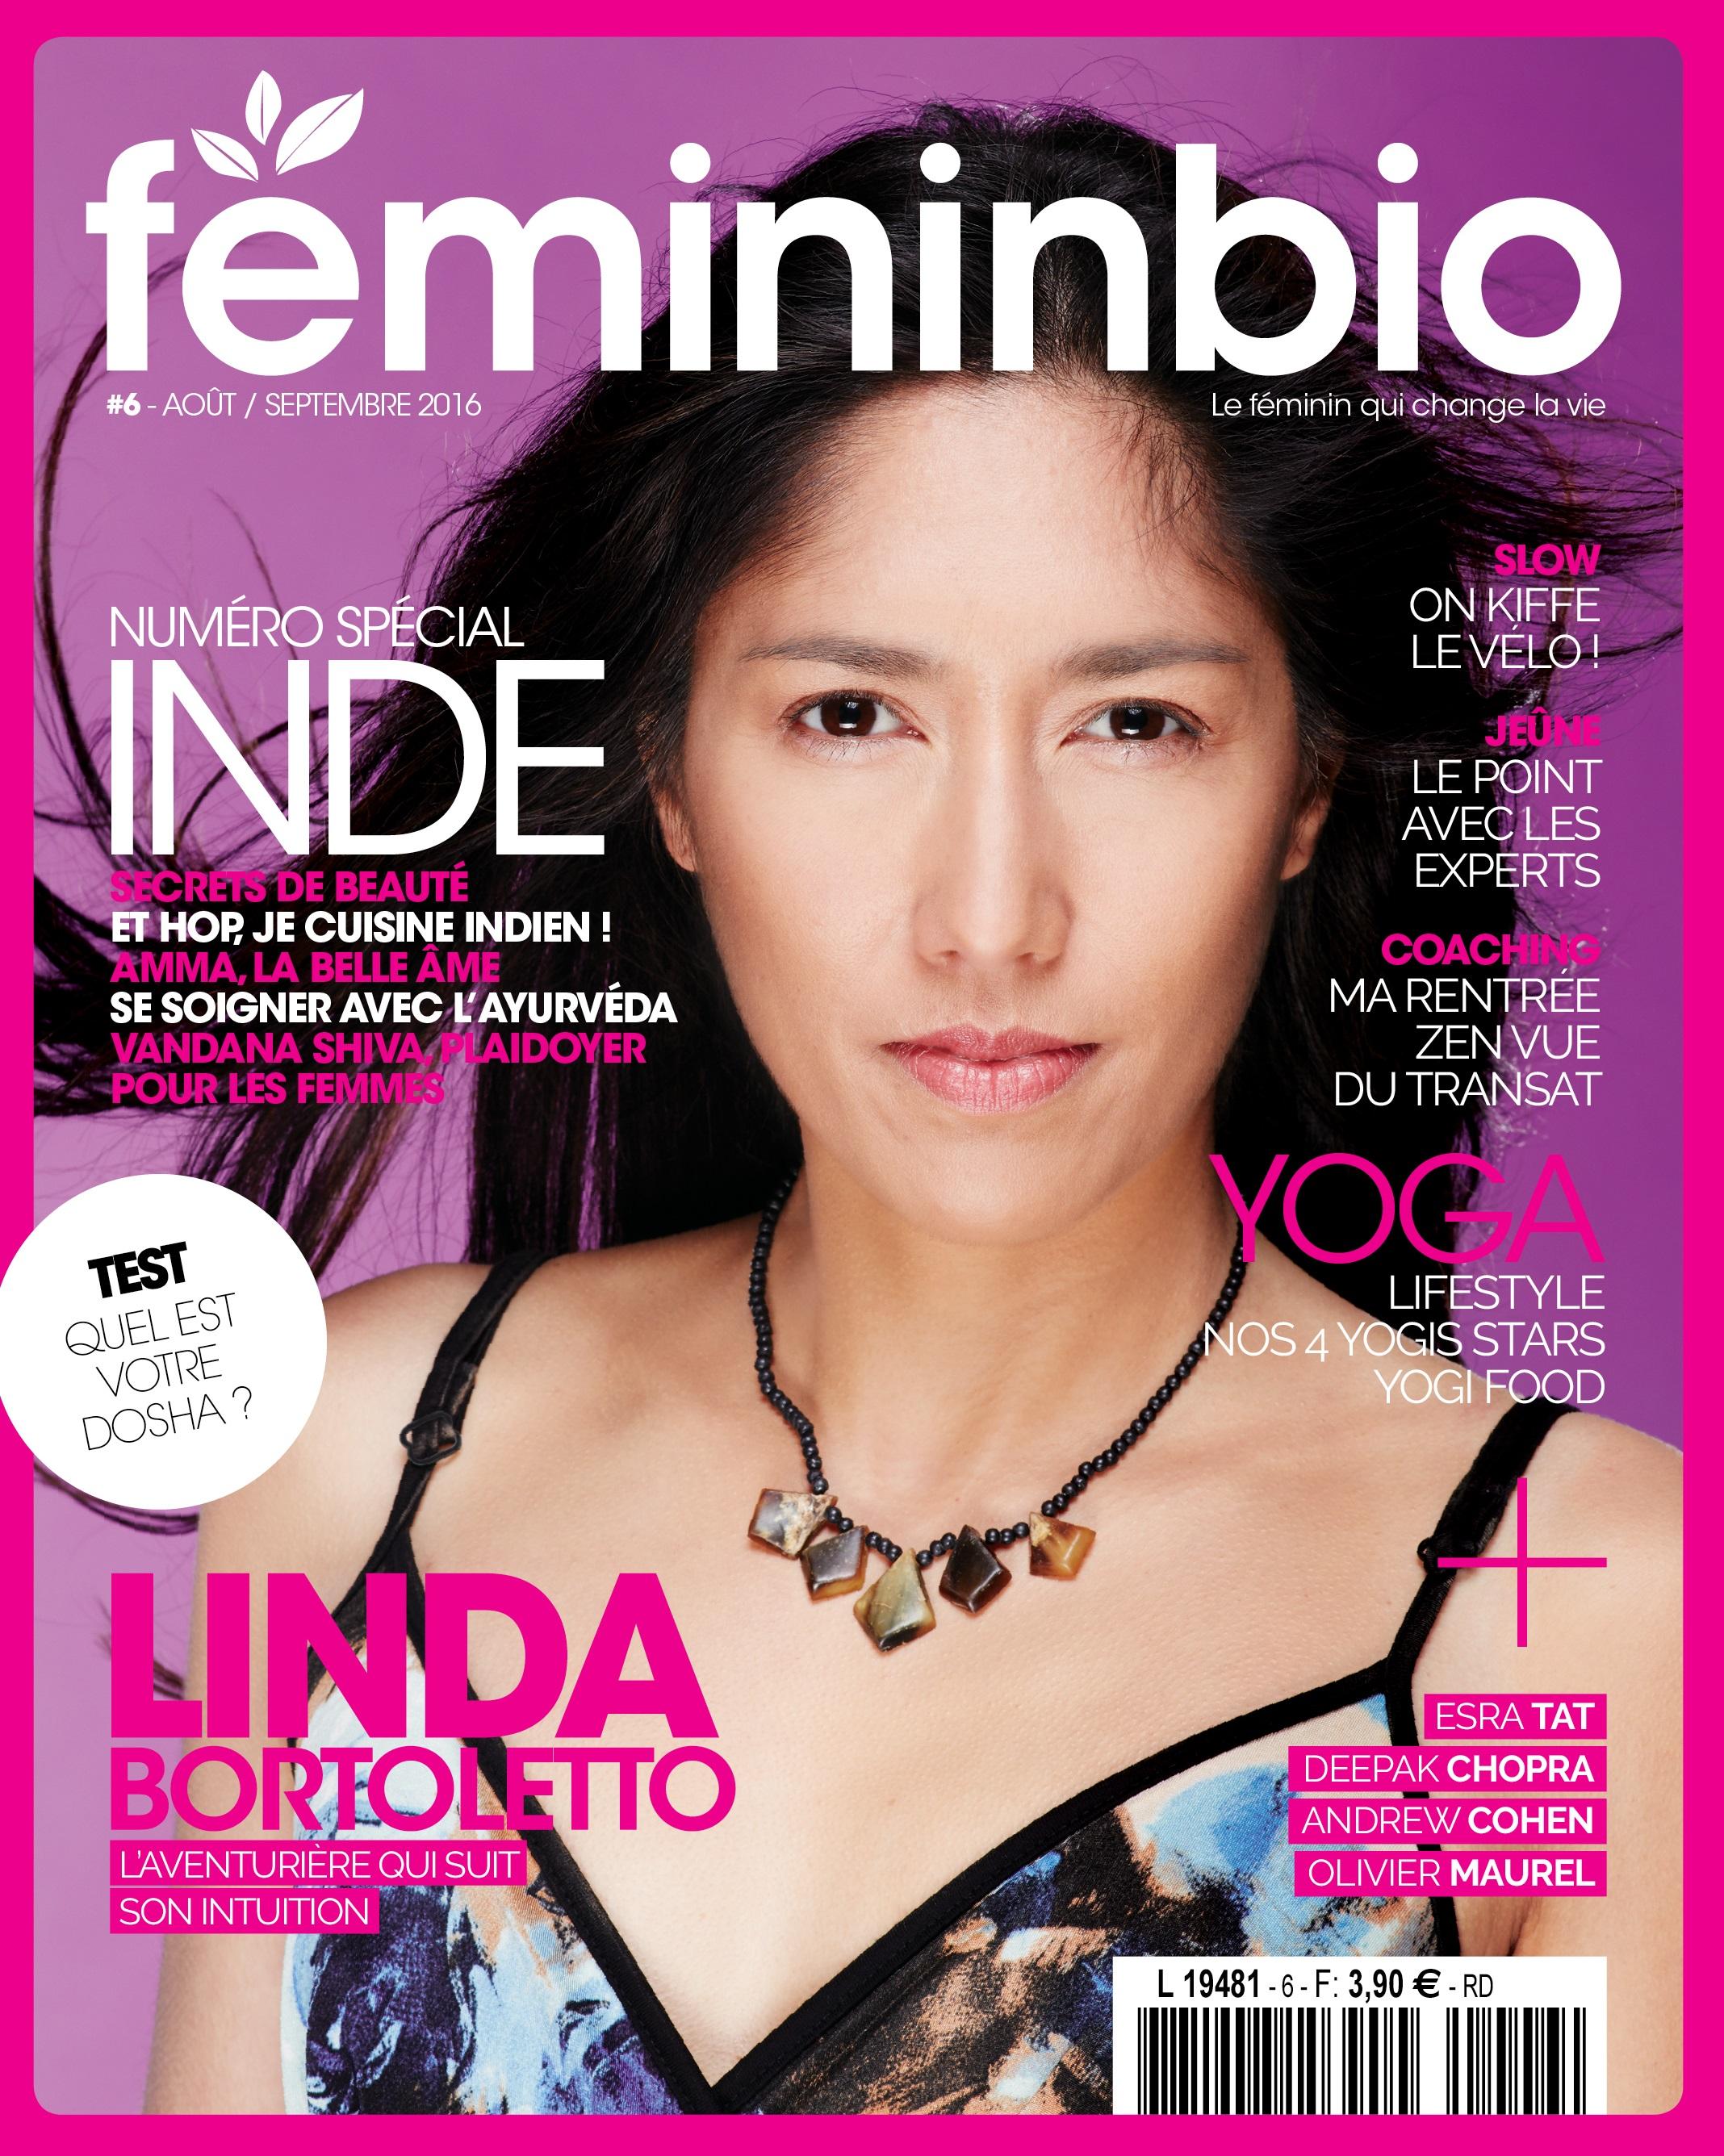 Féminin Bio - Juillet 2016 (   Lien   )